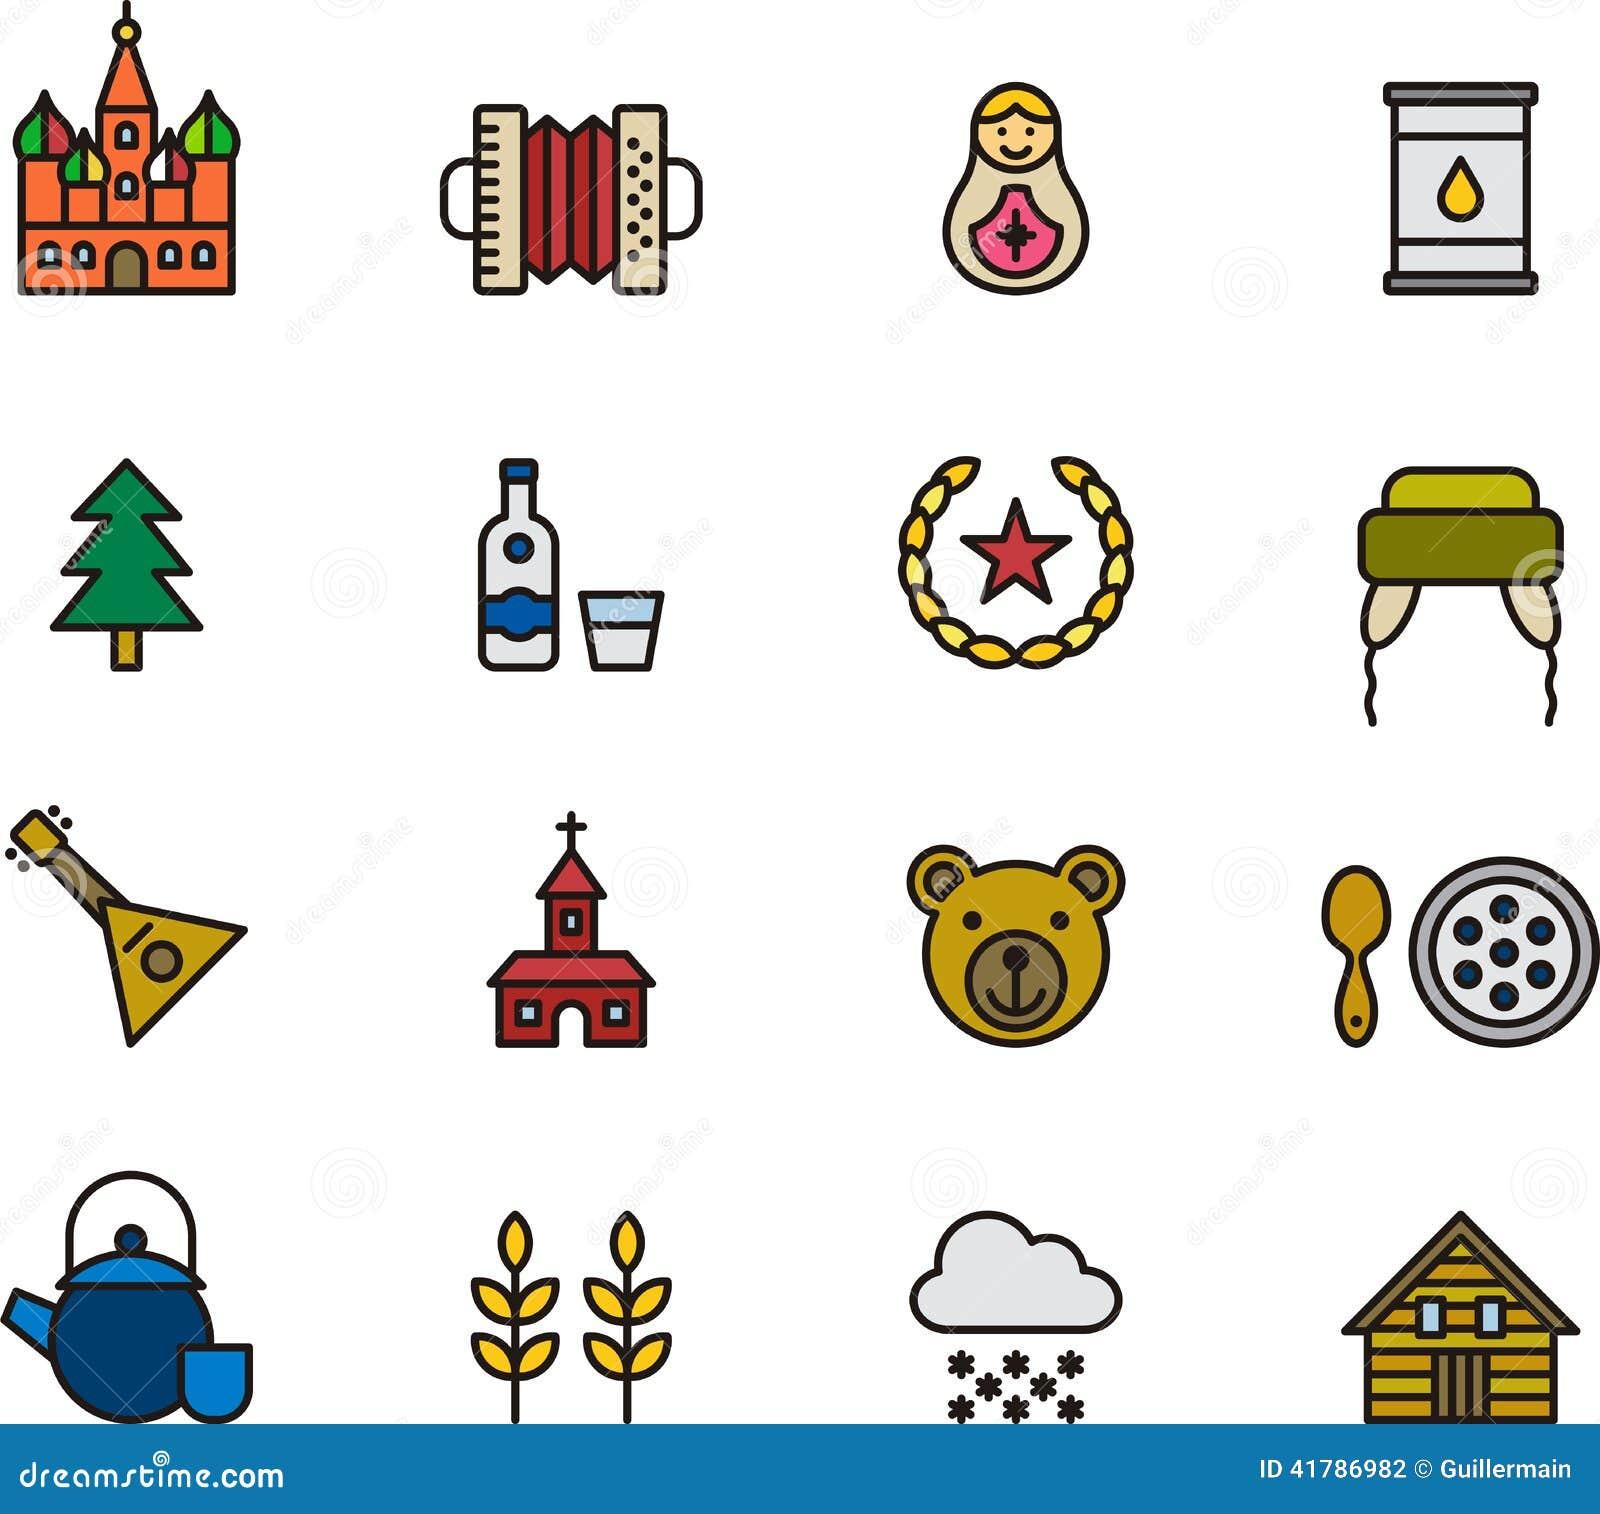 Значки россии, бесплатные фото, обои ...: pictures11.ru/znachki-rossii.html